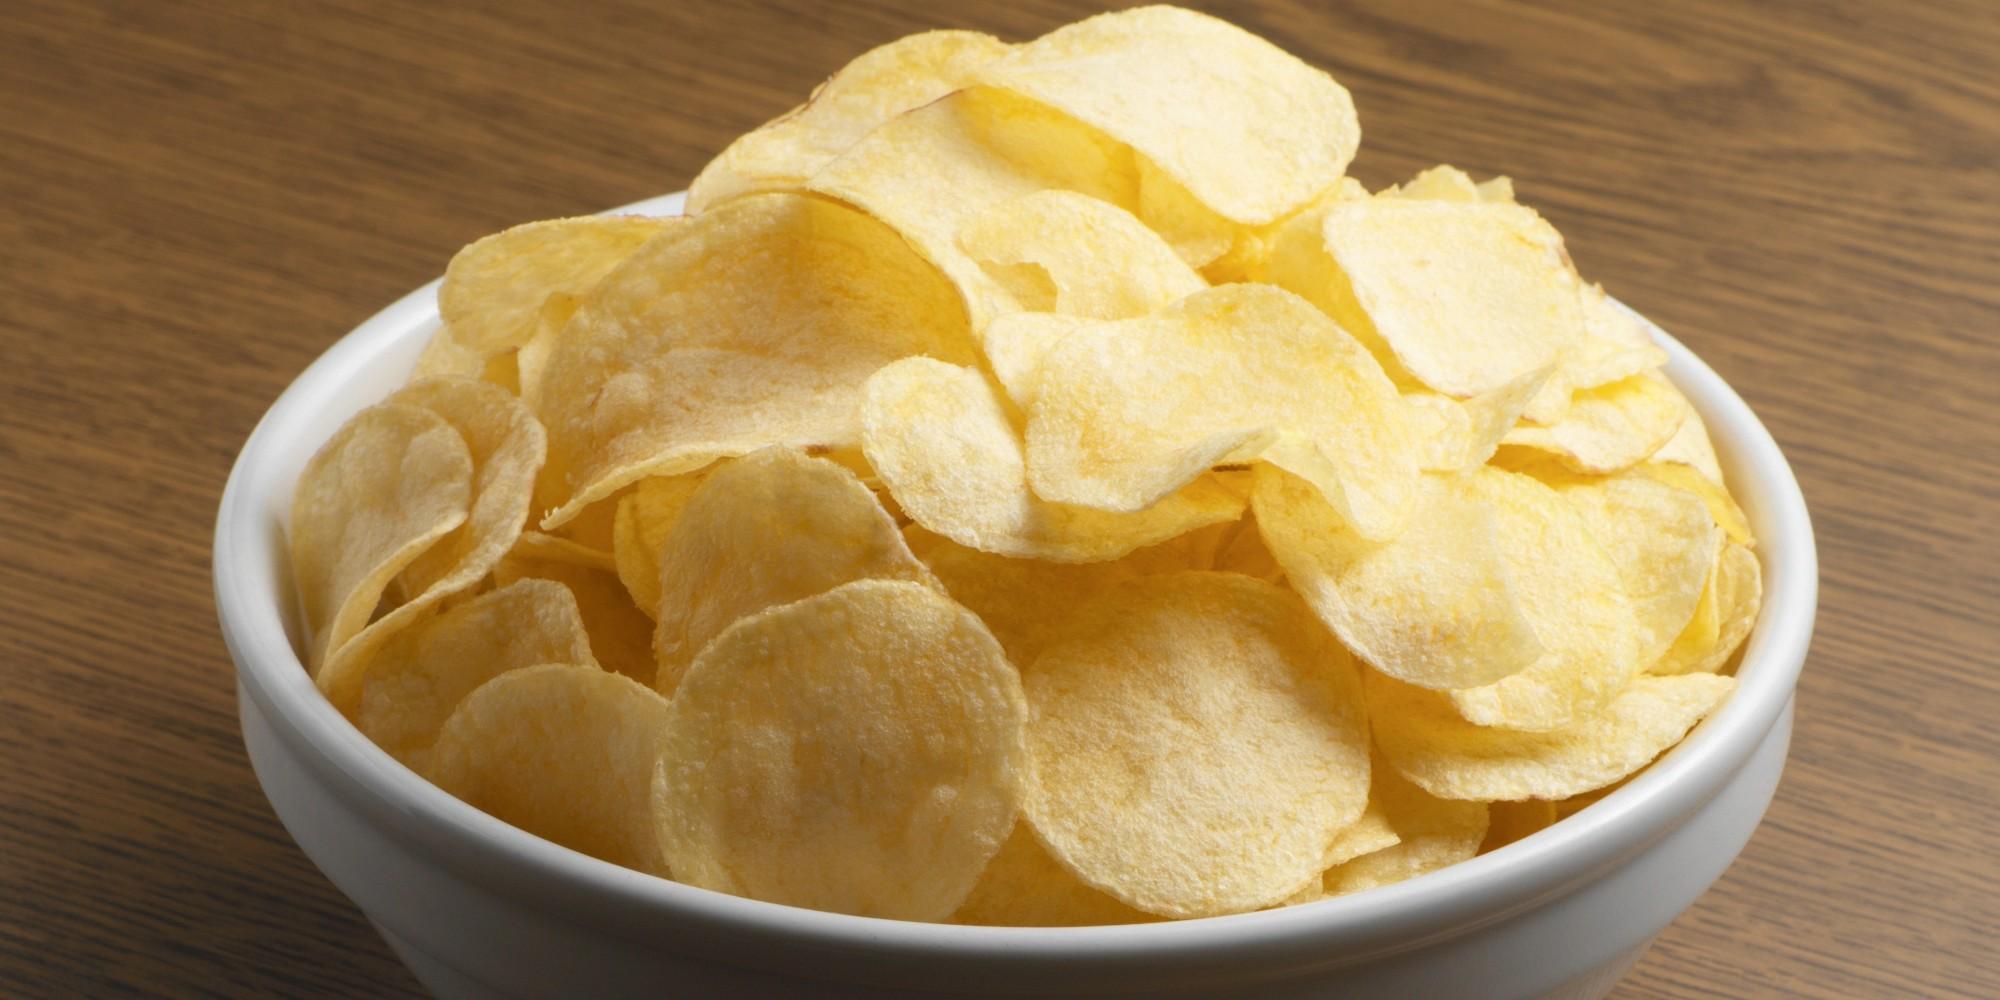 Image result for potato chips